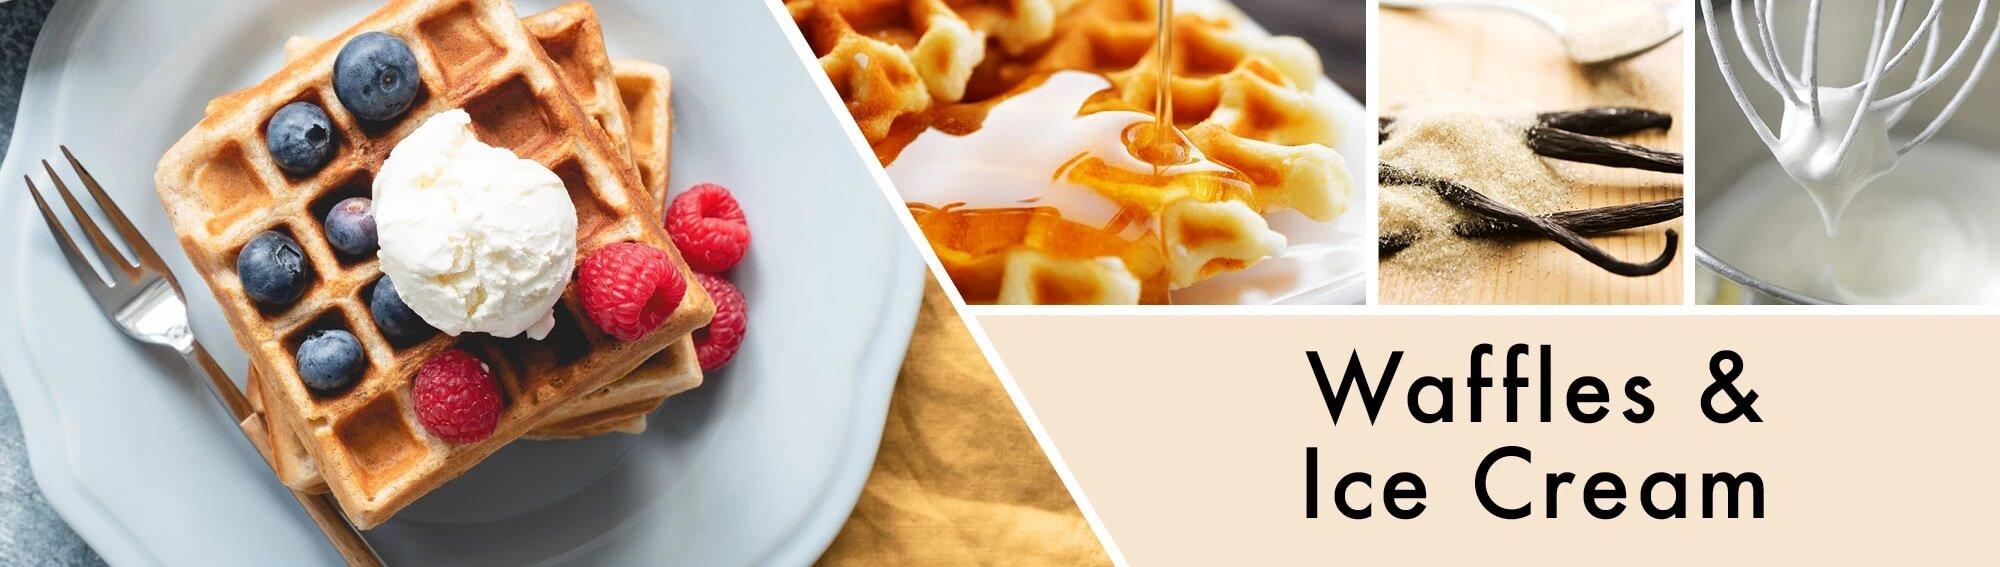 Waffles-Ice-Cream-Banner